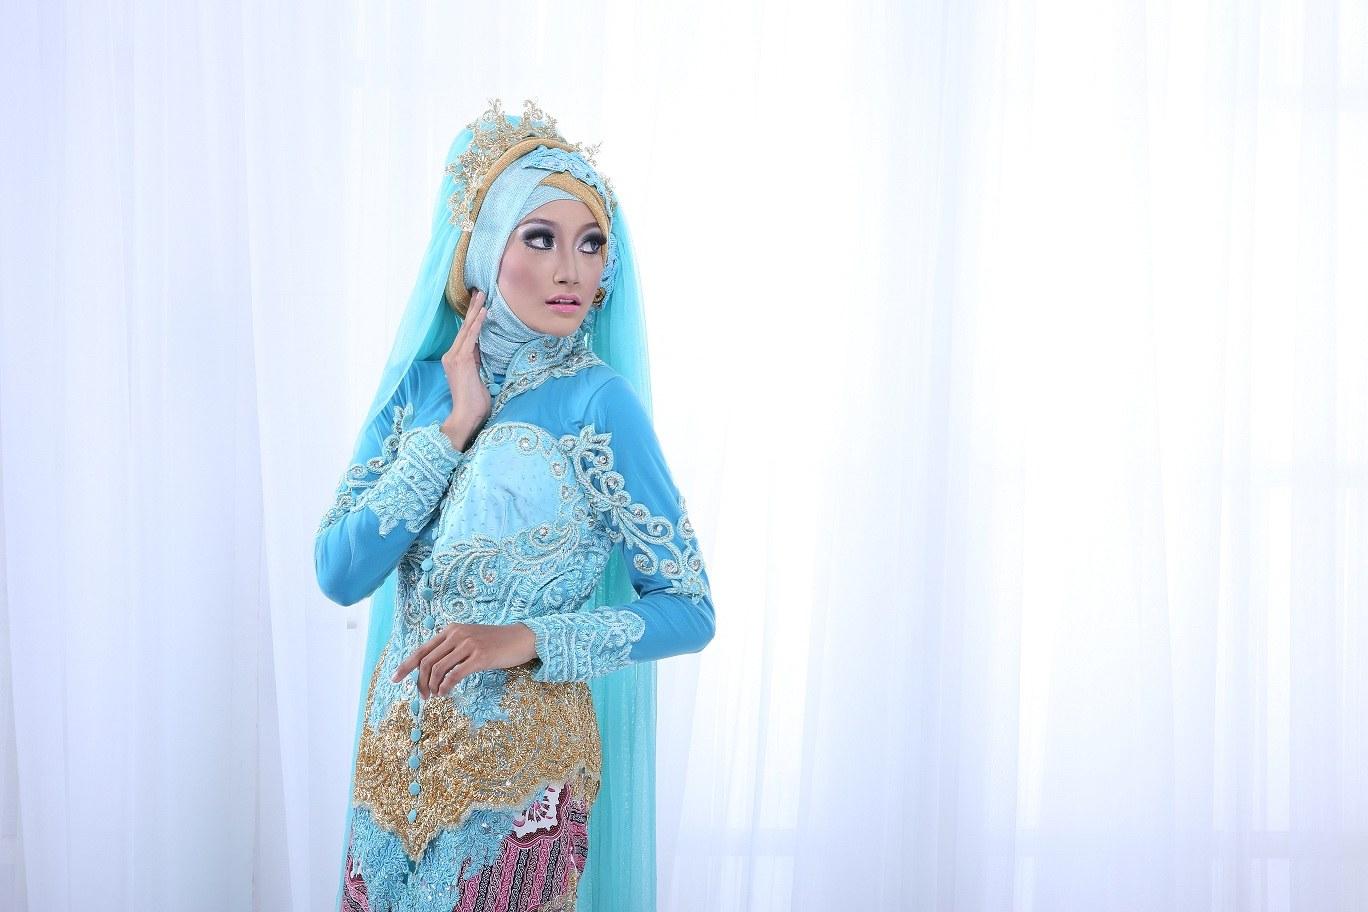 Design Sewa Baju Pengantin Muslimah Di Depok S1du Contoh Foto Mc Akad Nikah Dan Resepsi Archives